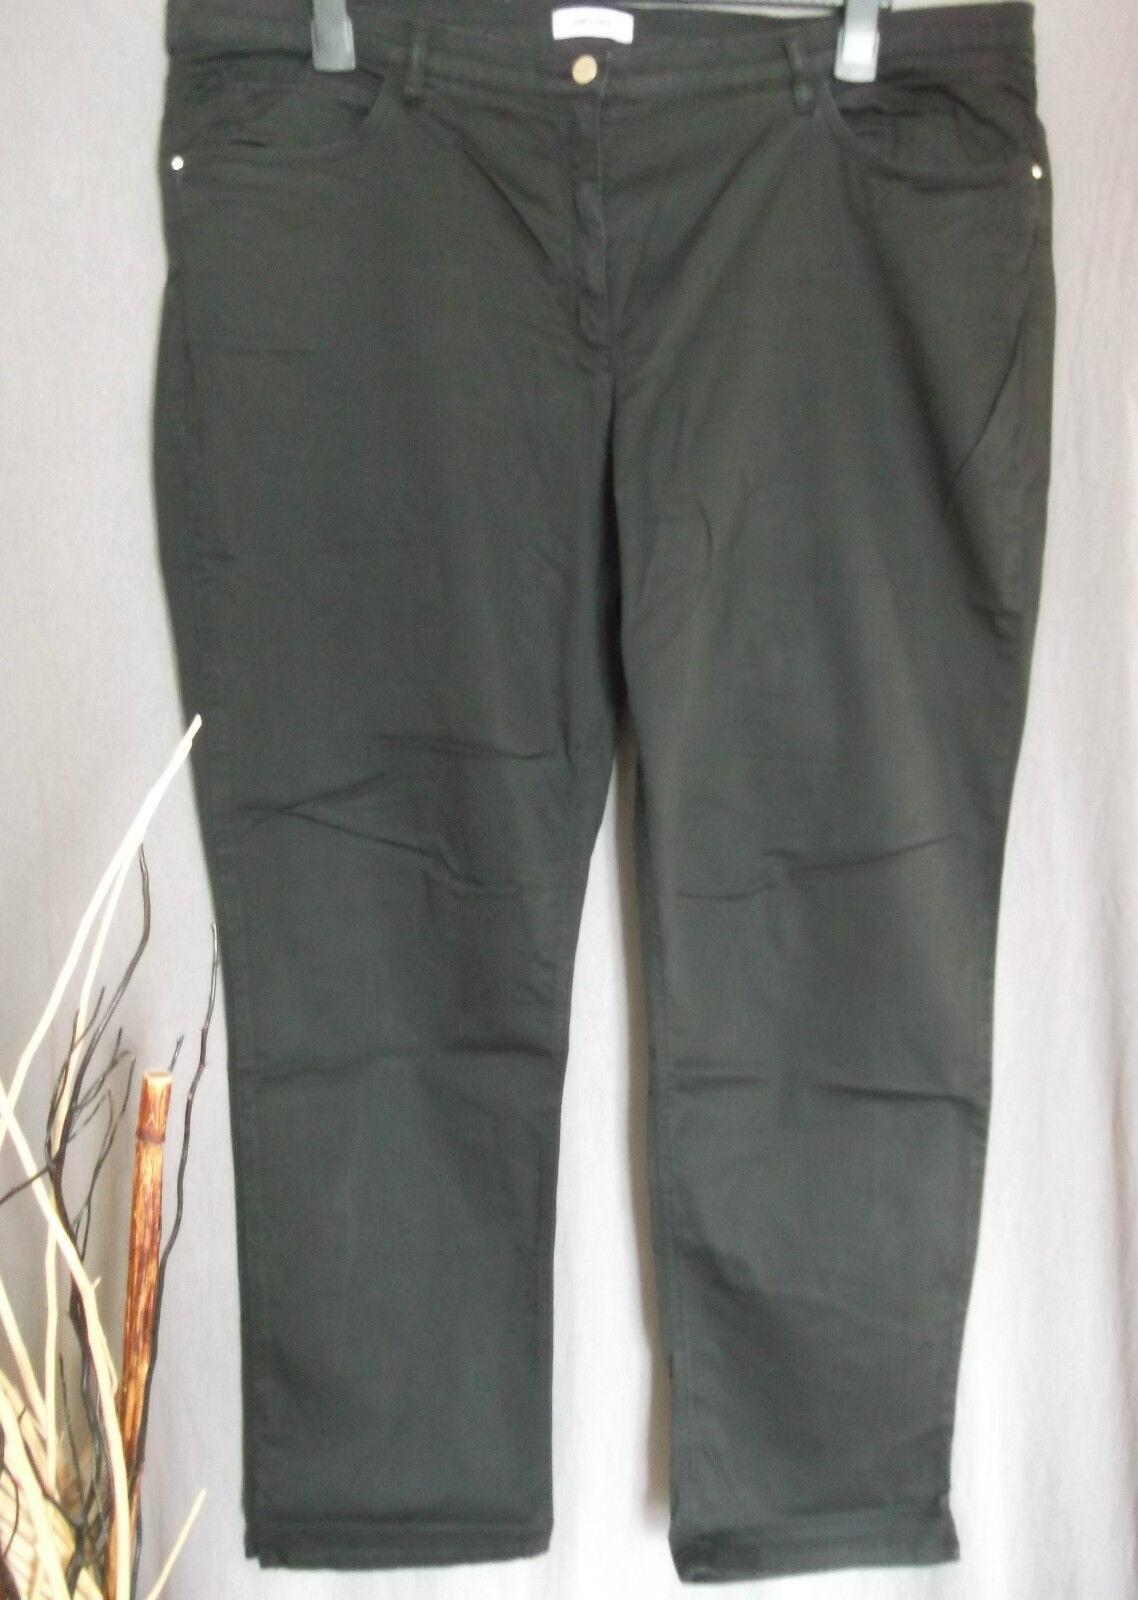 Persona Marina Rinaldi trousers ladies schwarz Größe 29 50